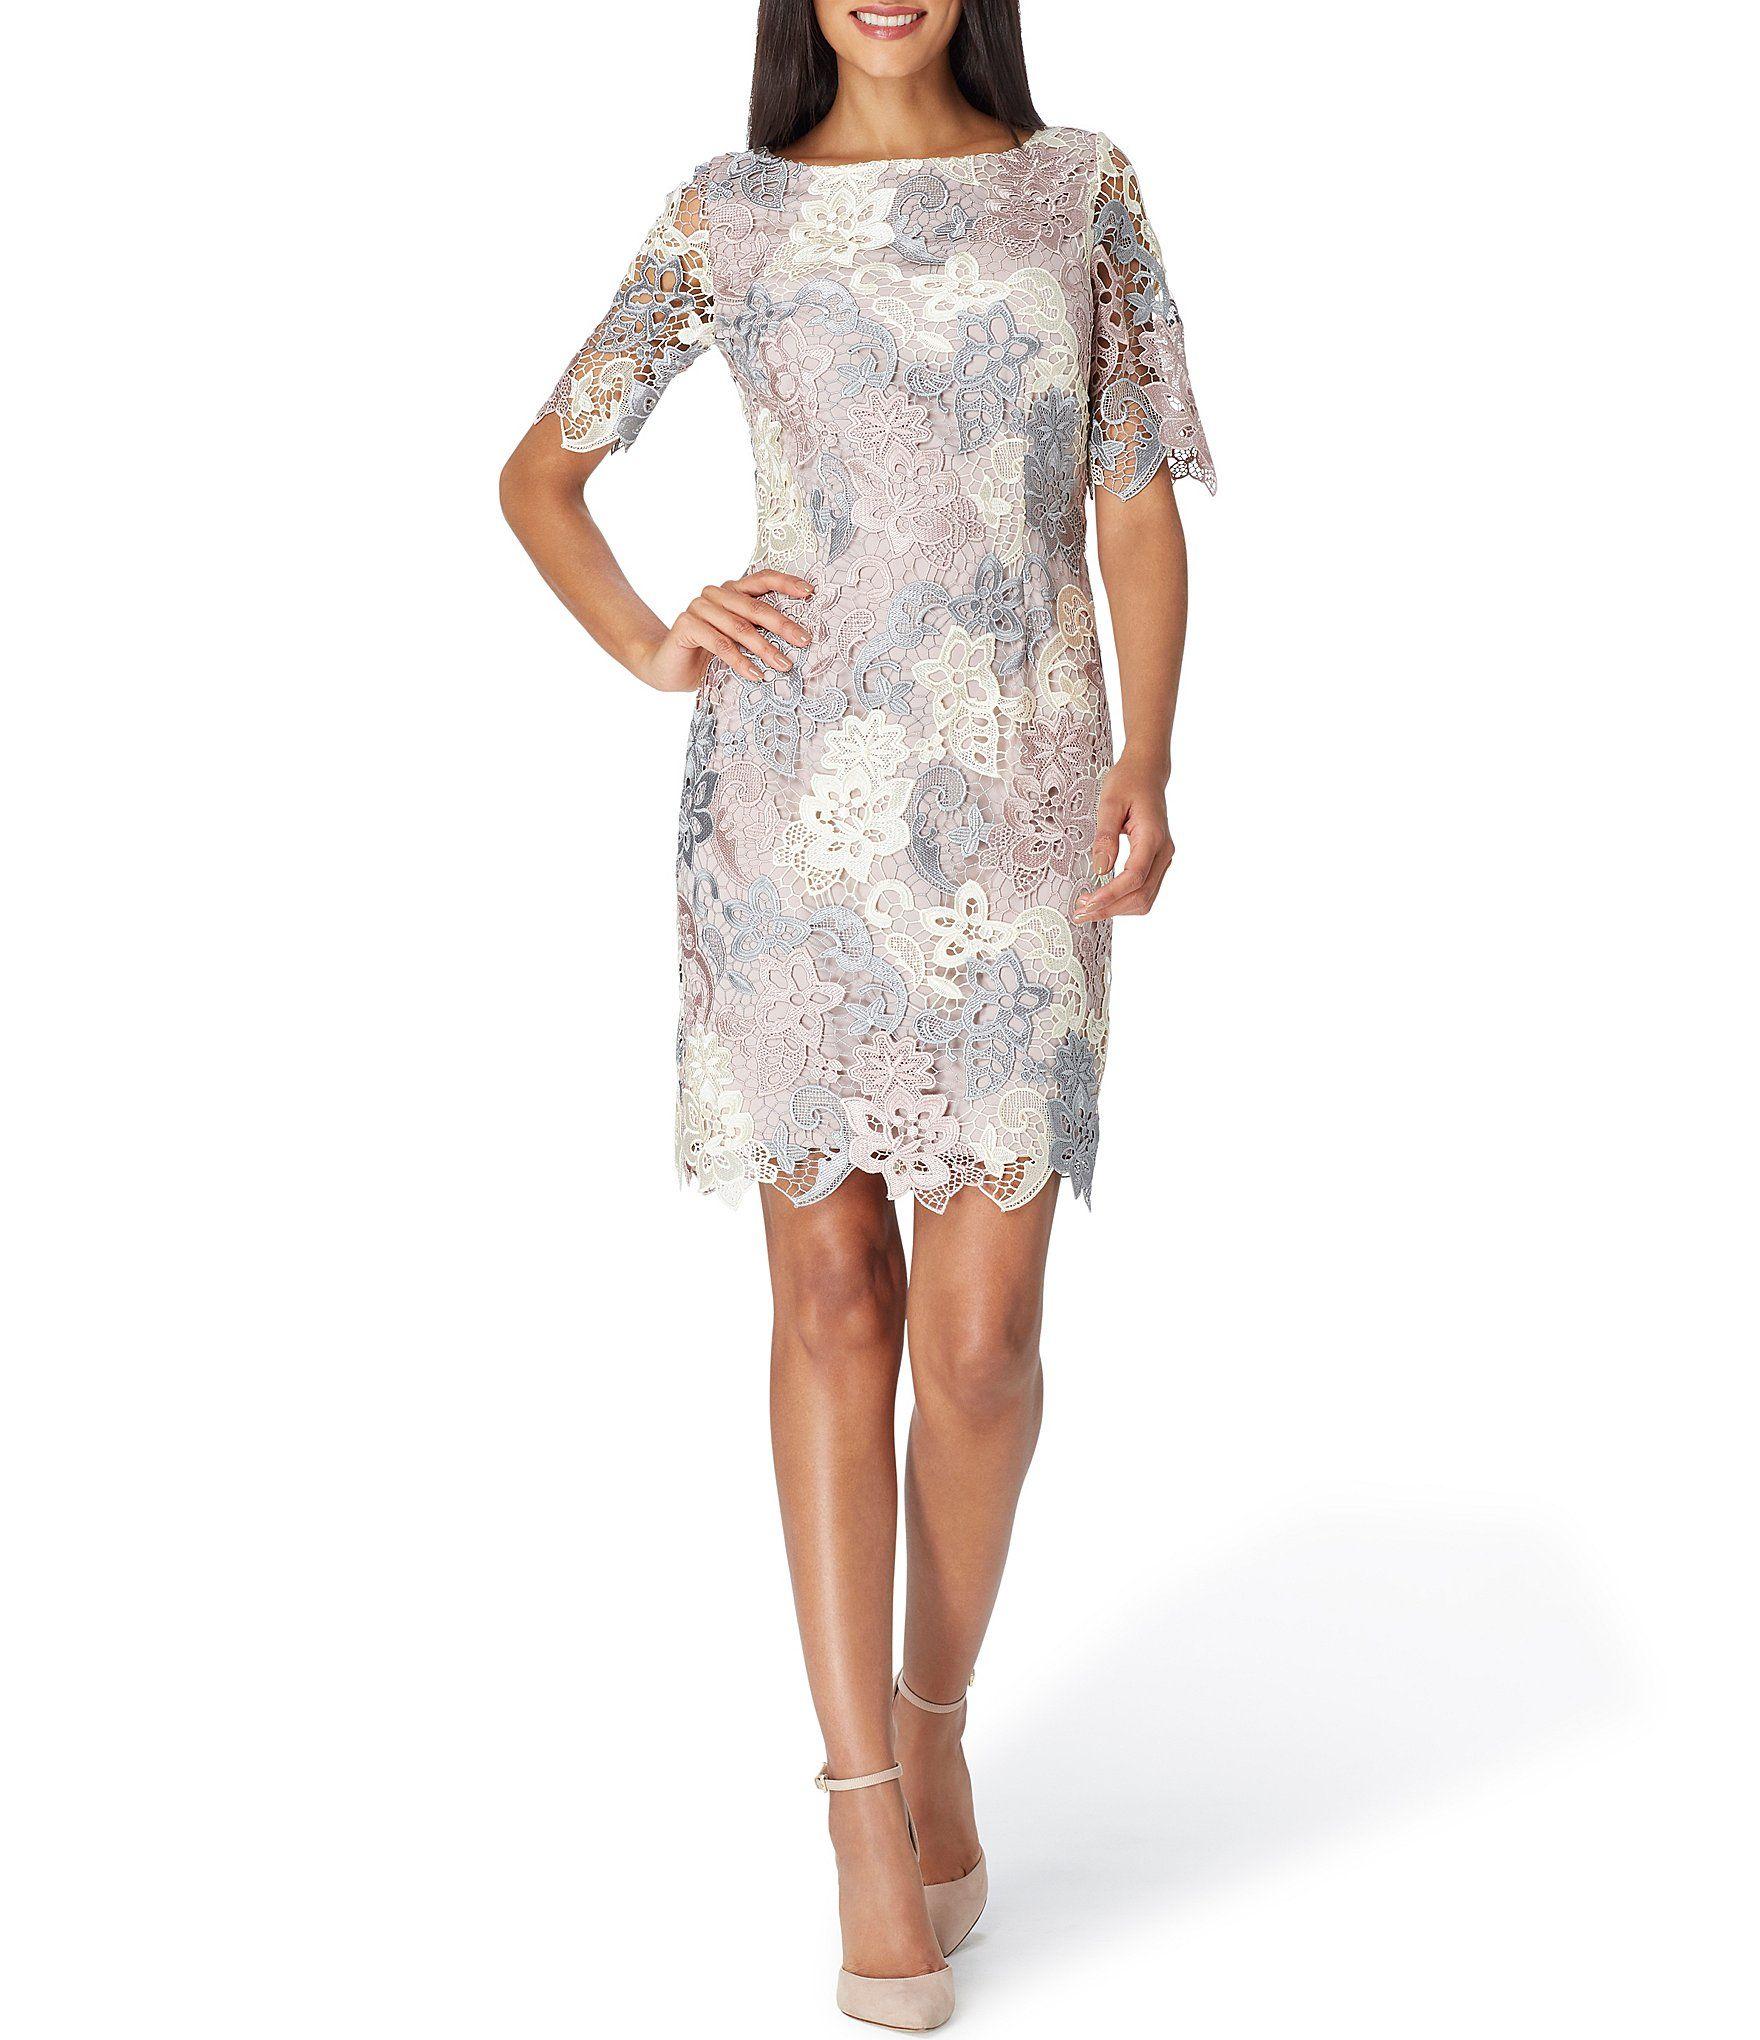 Shop For Tahari Asl Lace Sheath Dress At Dillards Com Visit Dillards Com To Find Clothing Accessories Shoe Trendy Cocktail Dresses Lace Sheath Dress Dresses [ 2040 x 1760 Pixel ]